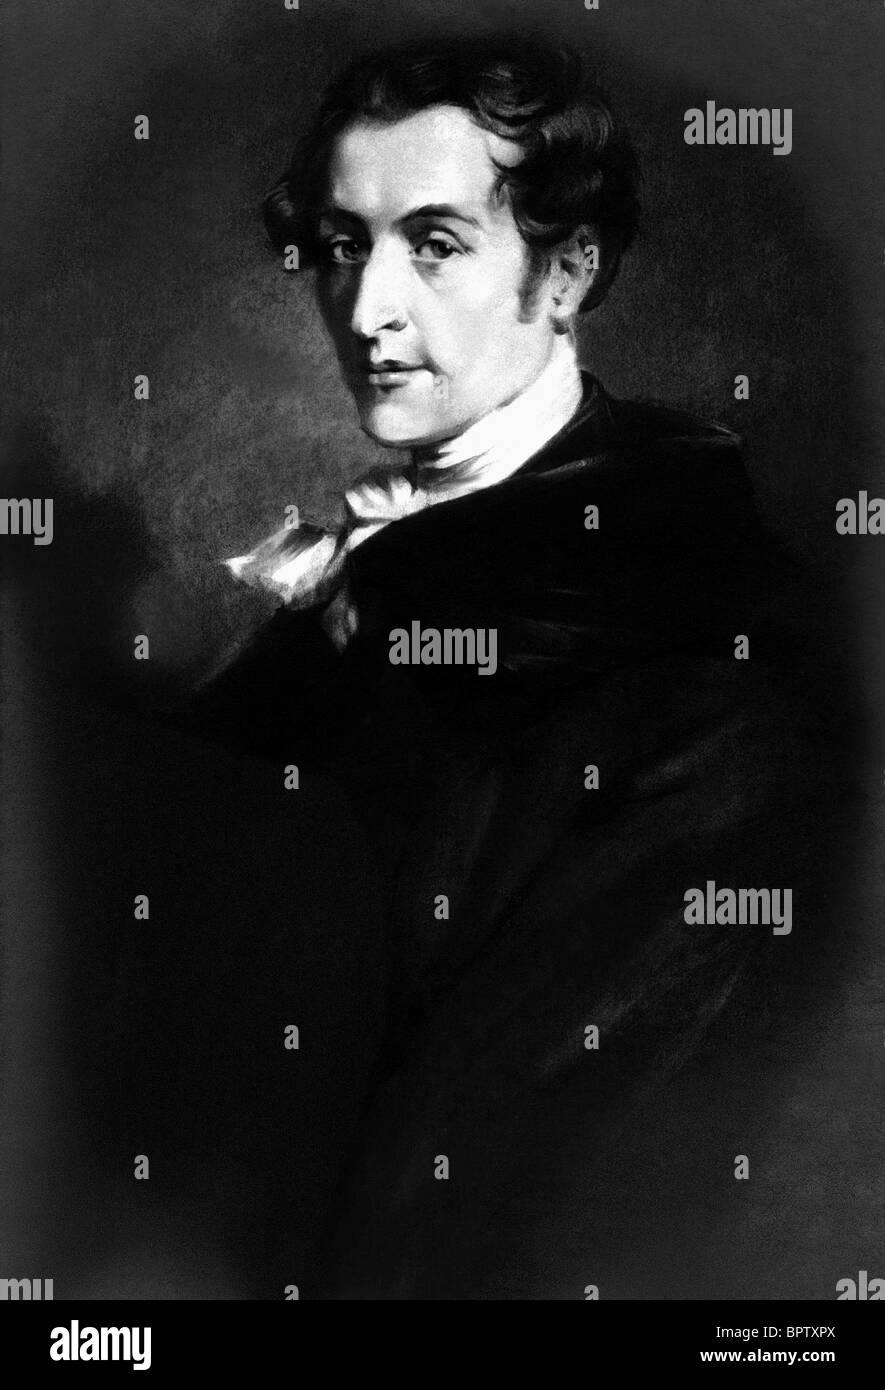 CARL MARIE VON WEBER MUSIC COMPOSER (1824) - Stock Image